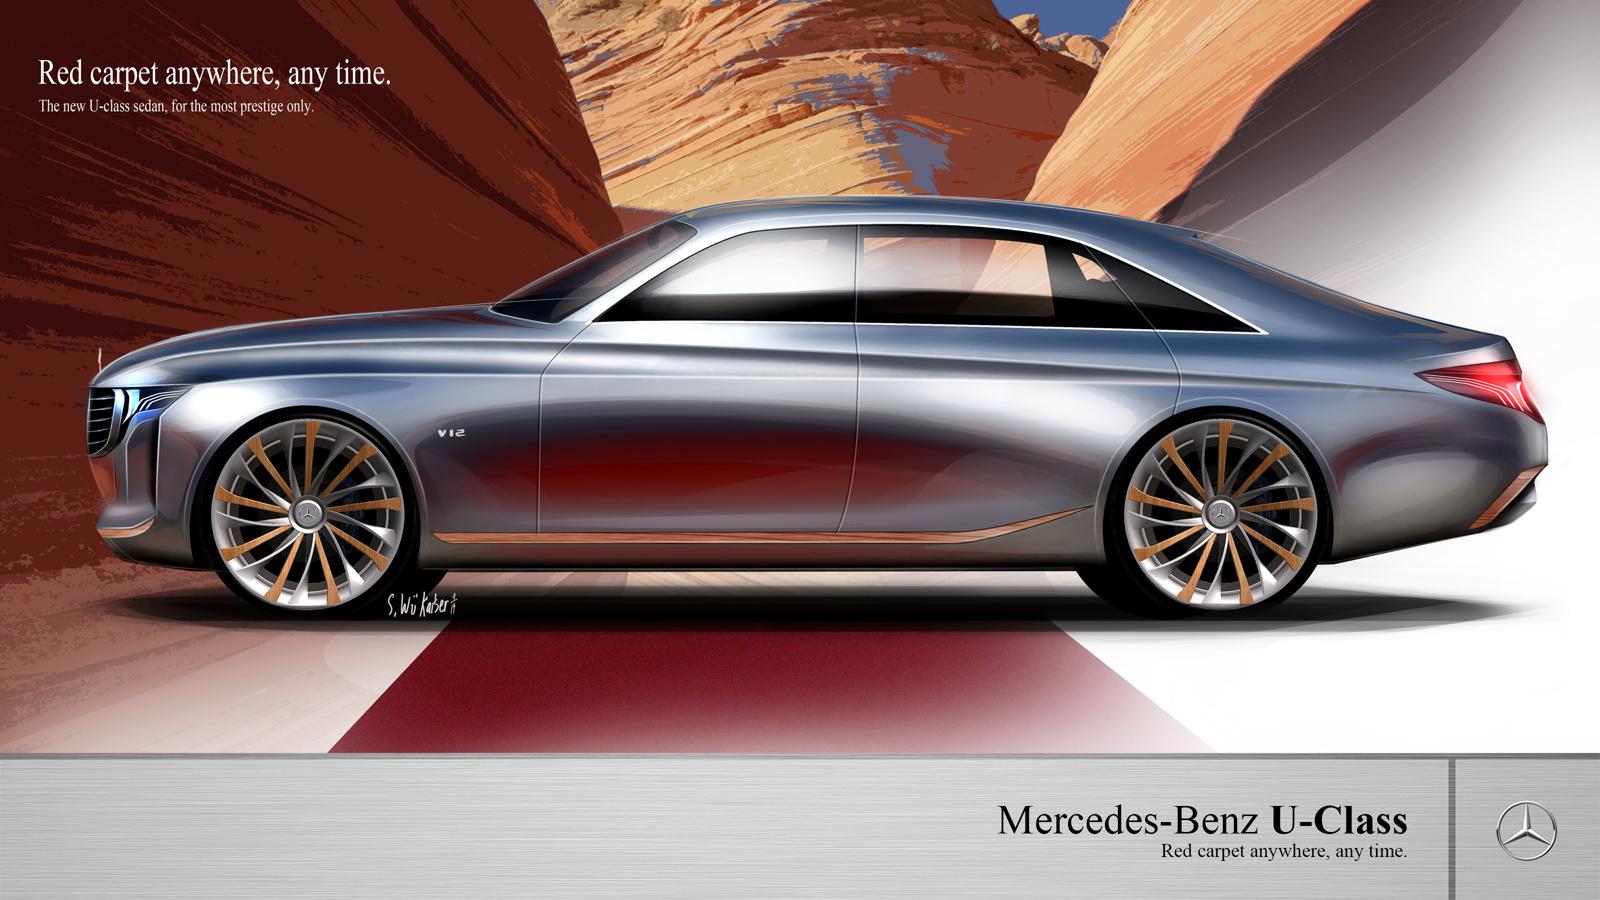 Mercedes Benz U Class Concept Redefines Luxury As An